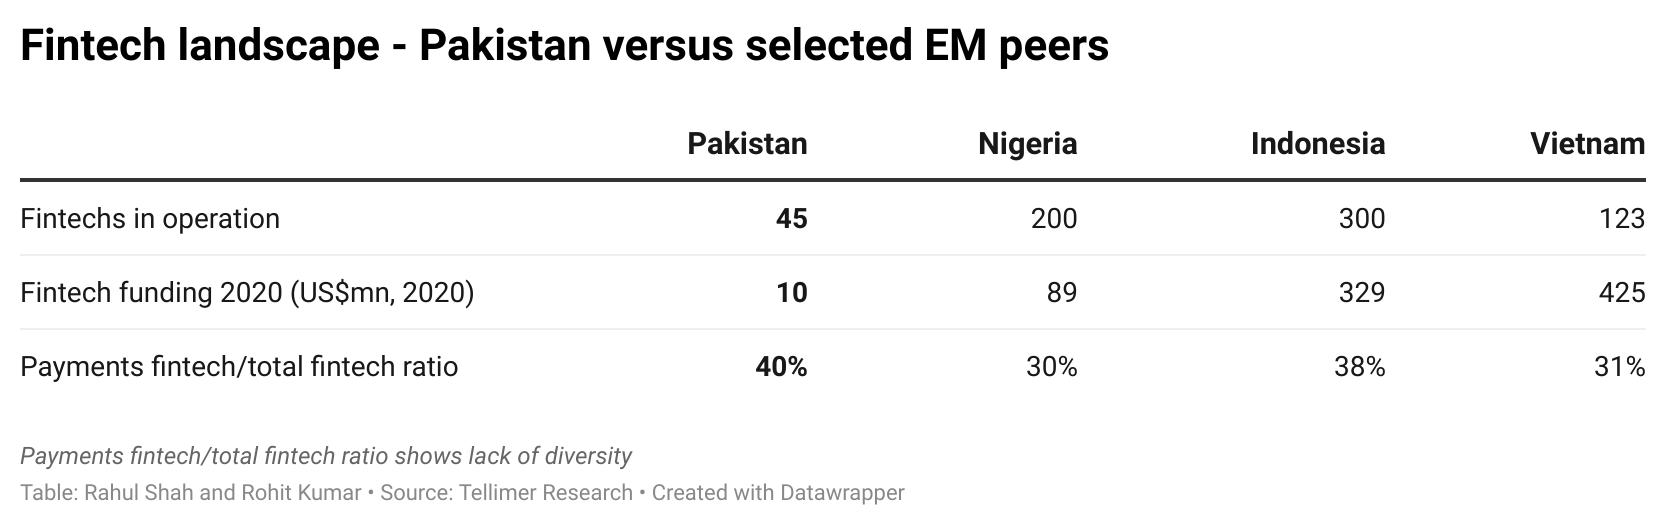 Fintech landscape - Pakistan versus selected EM peers